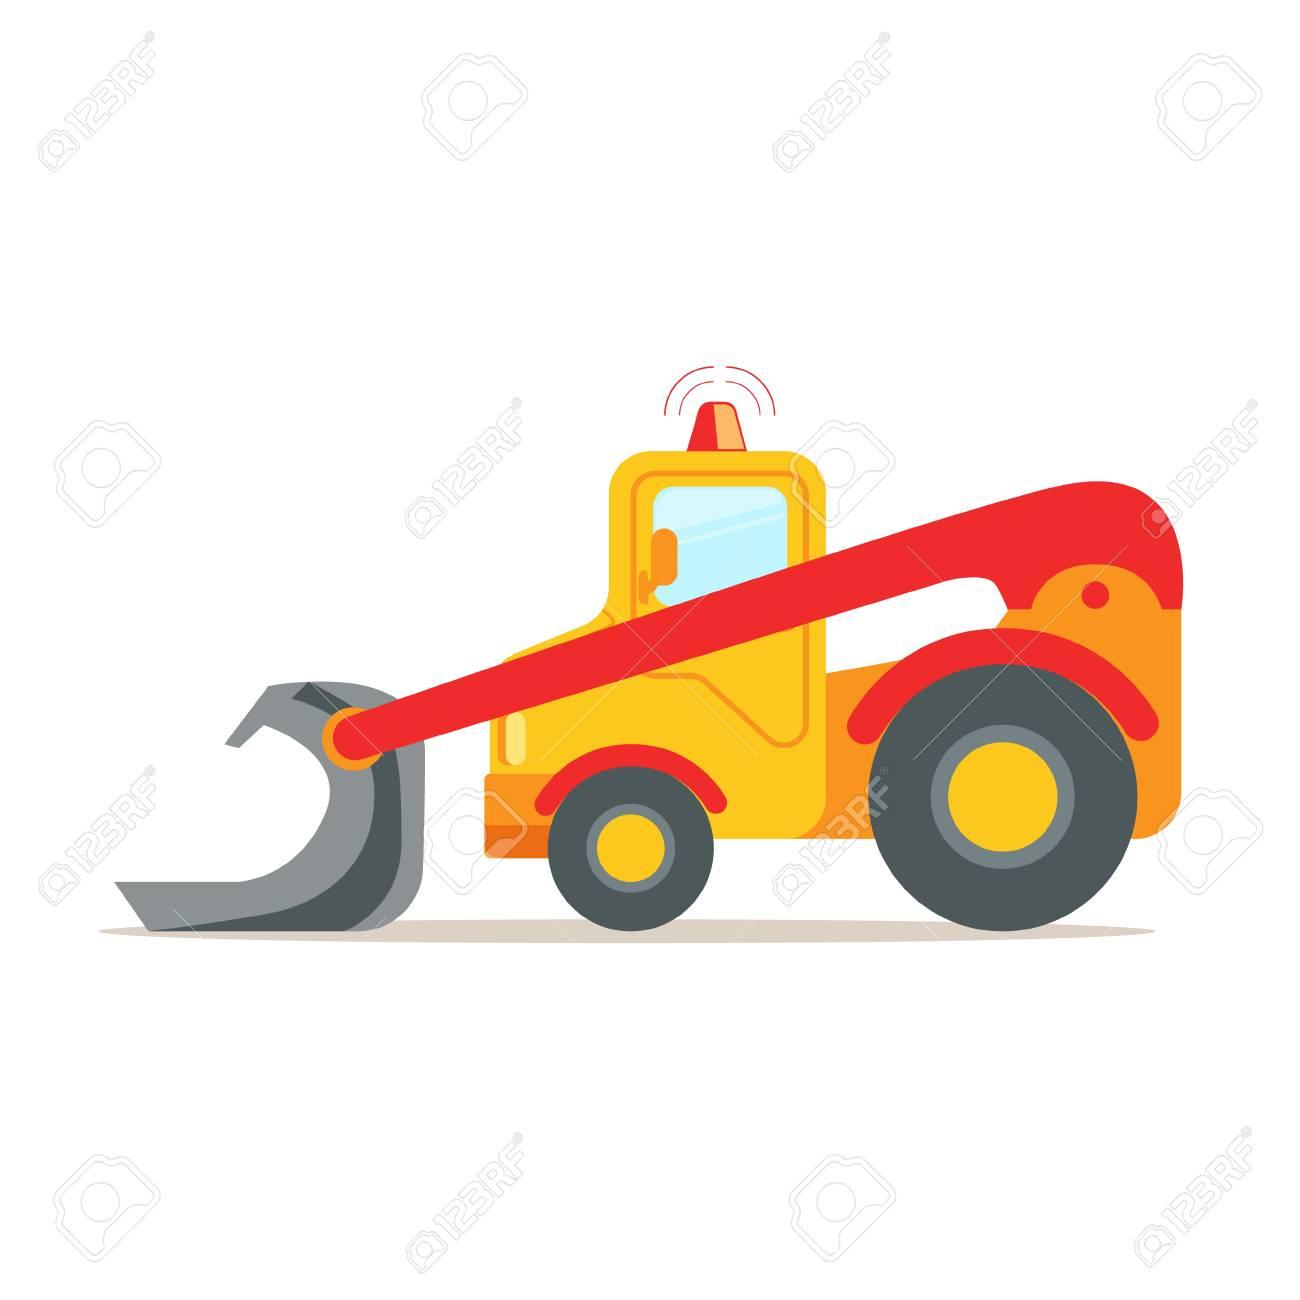 Escavadora Amarela Equipamento De Maquinas Para Construcao Vetor